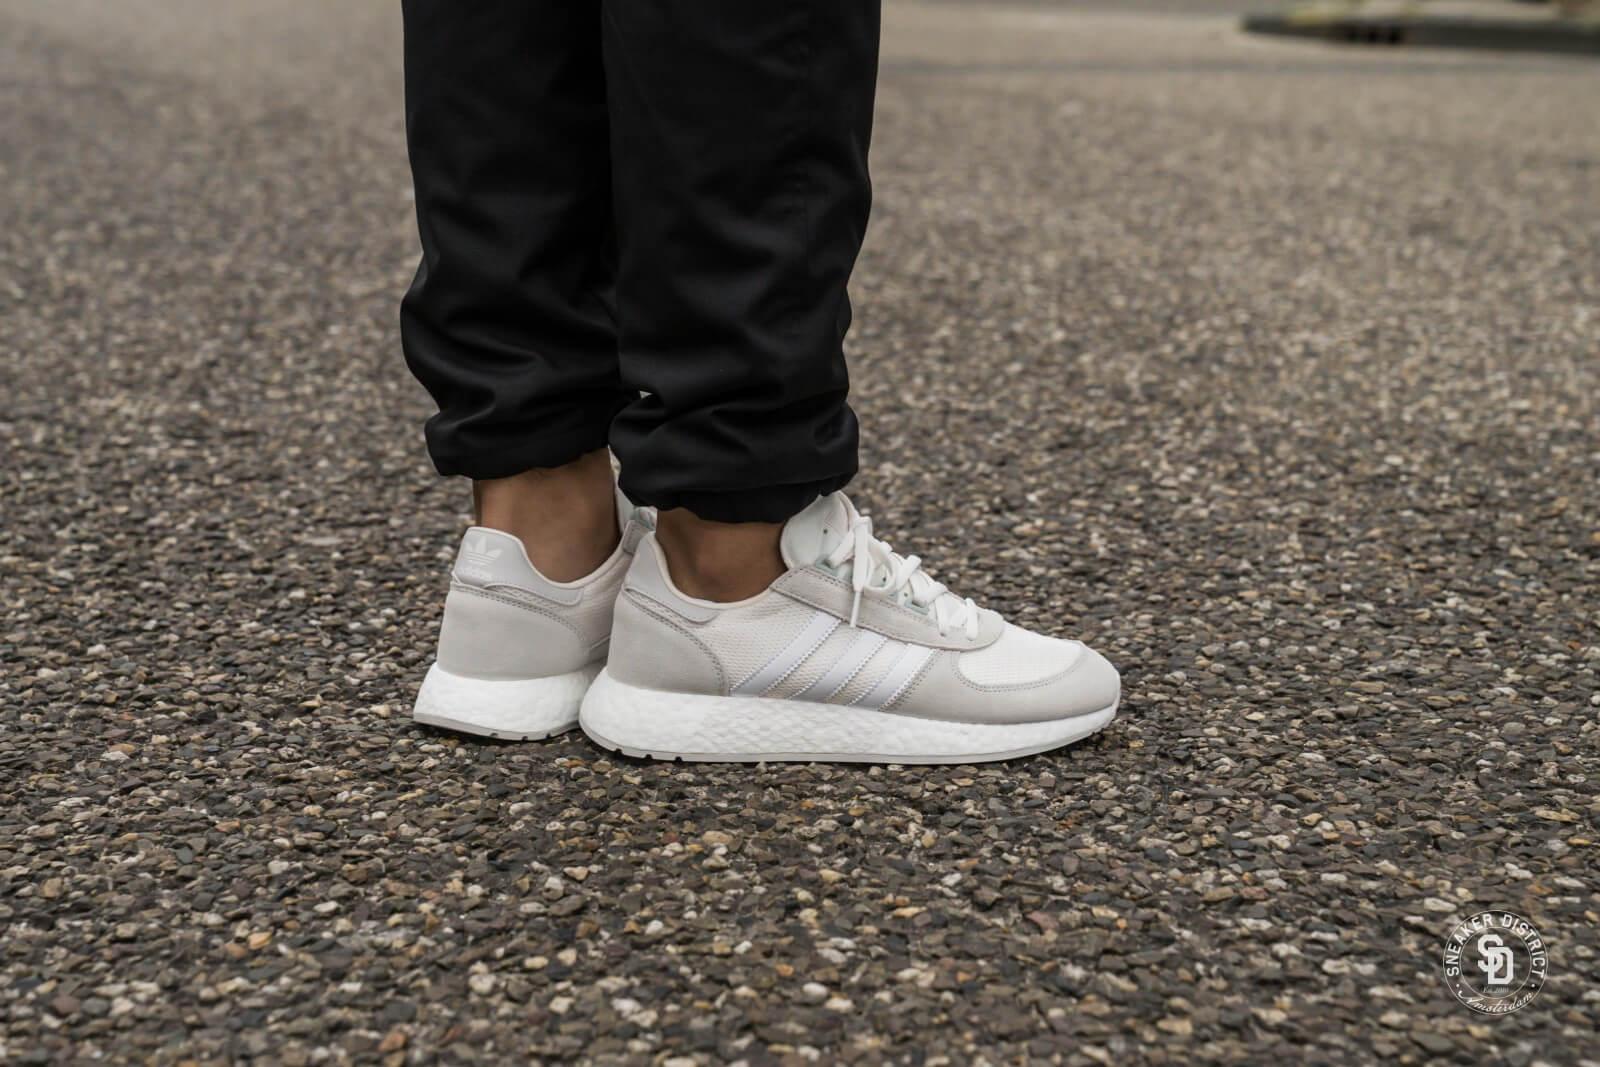 Adidas Marathon 5923 Cloud White